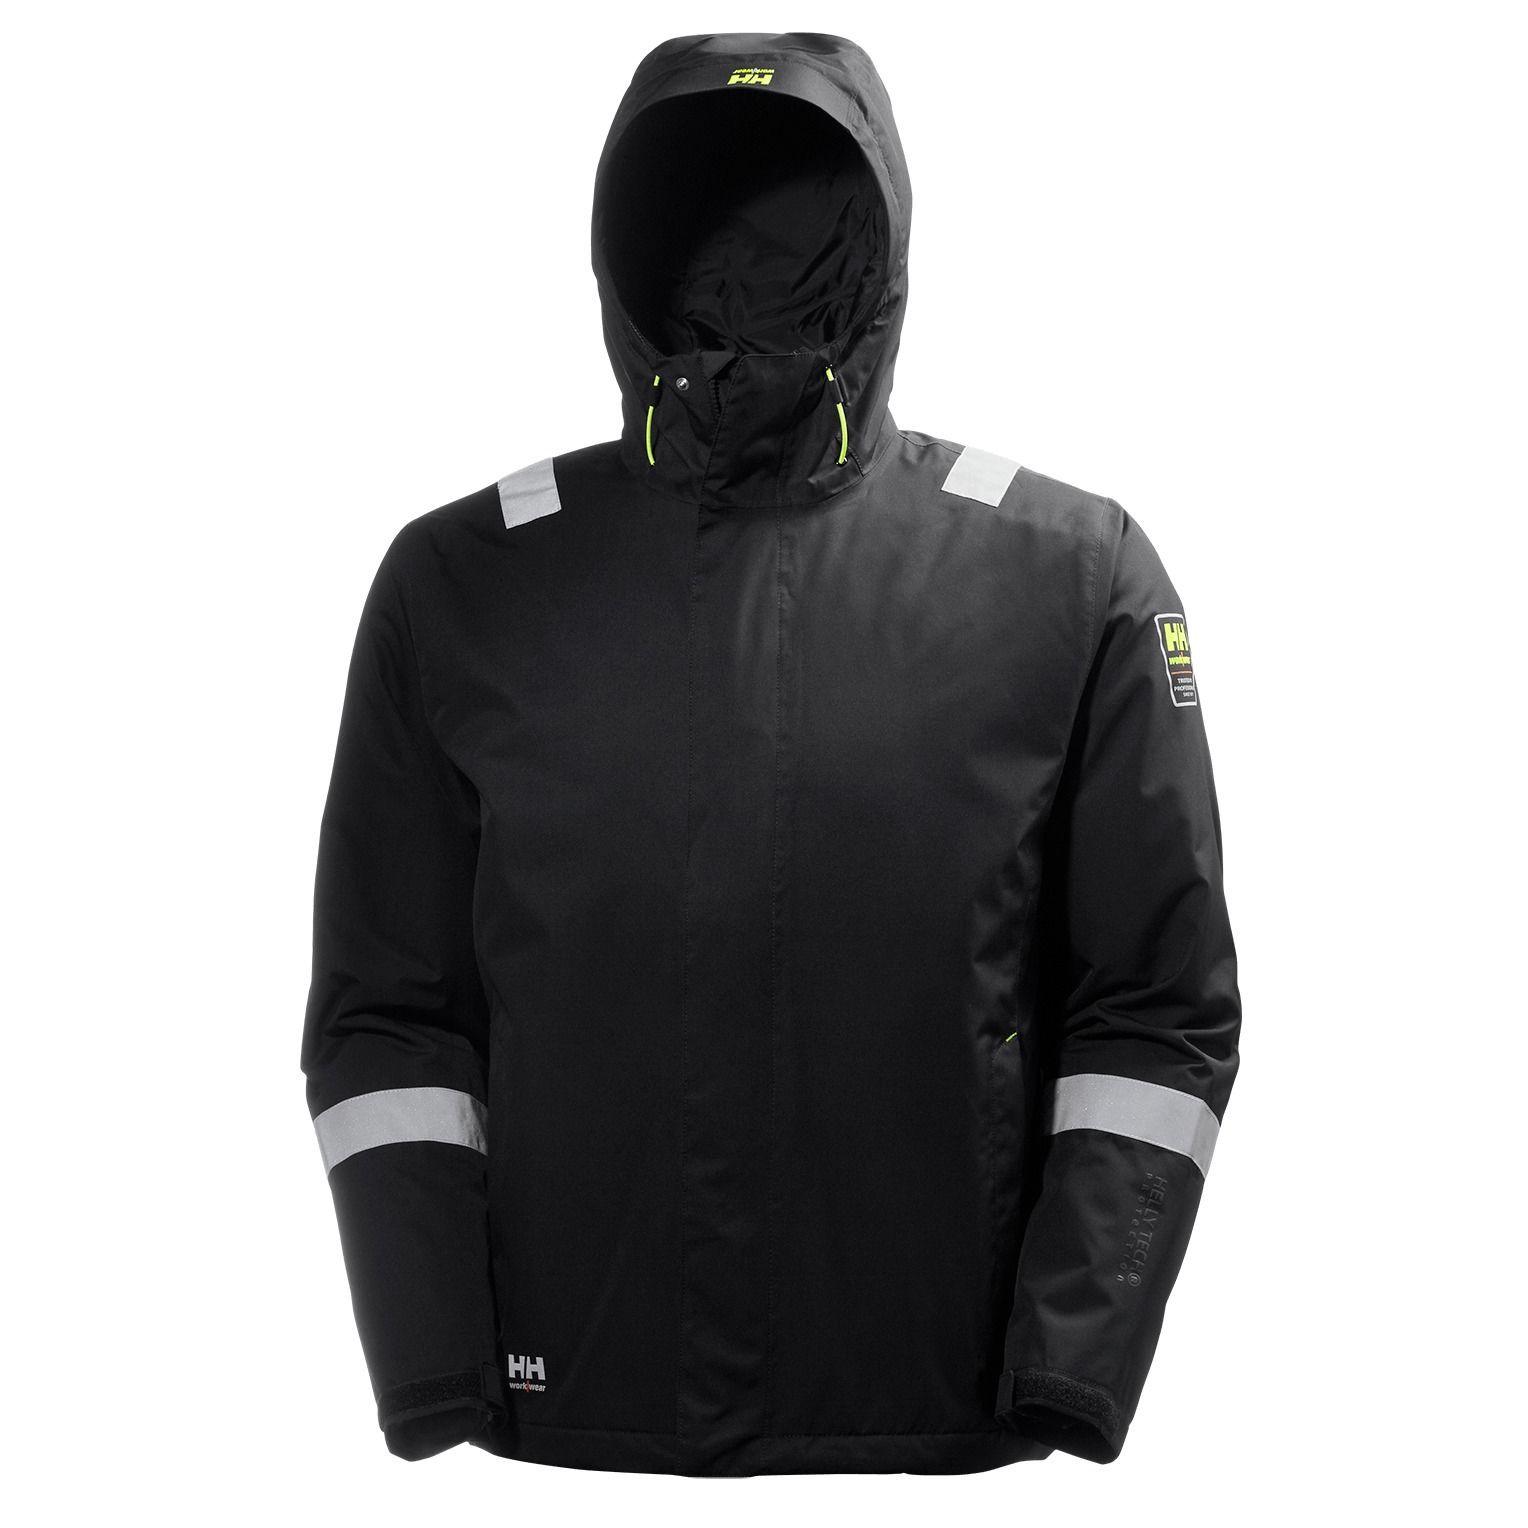 Куртка Helly Hansen Aker Winterjacket - 71351 (Black; M)